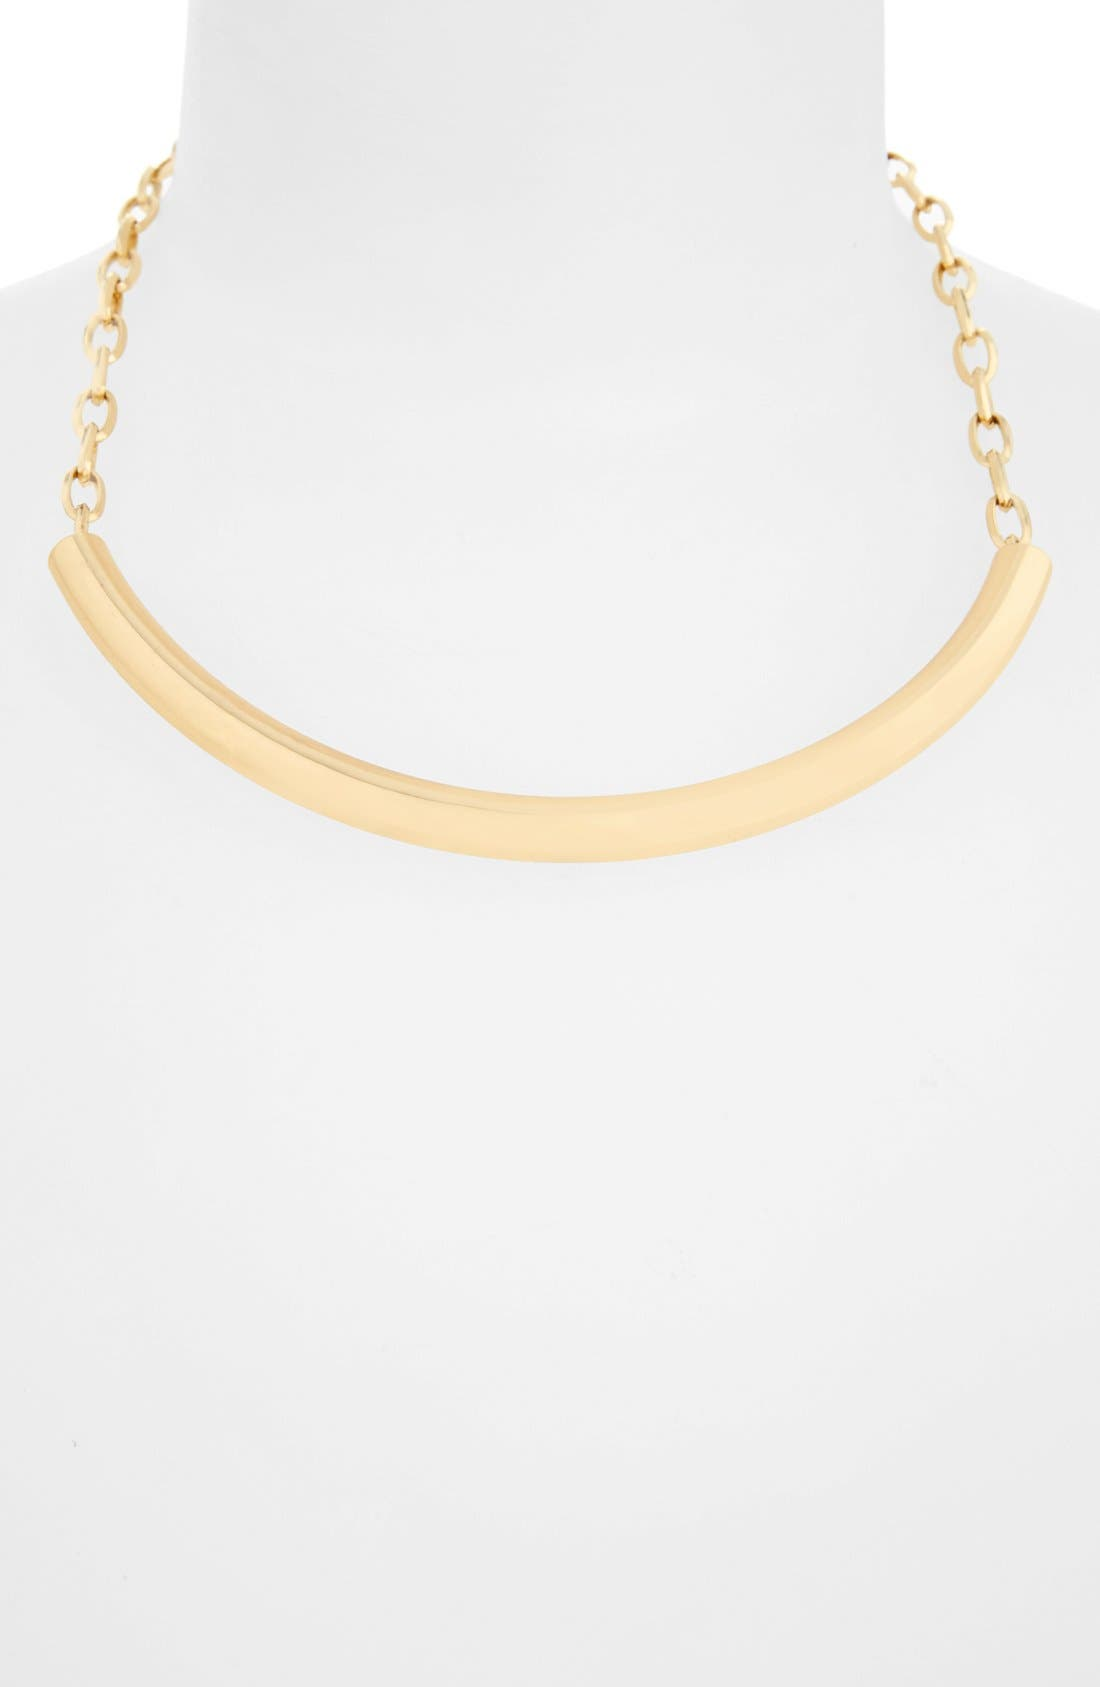 Main Image - Nordstrom Metal Bar Statement Necklace